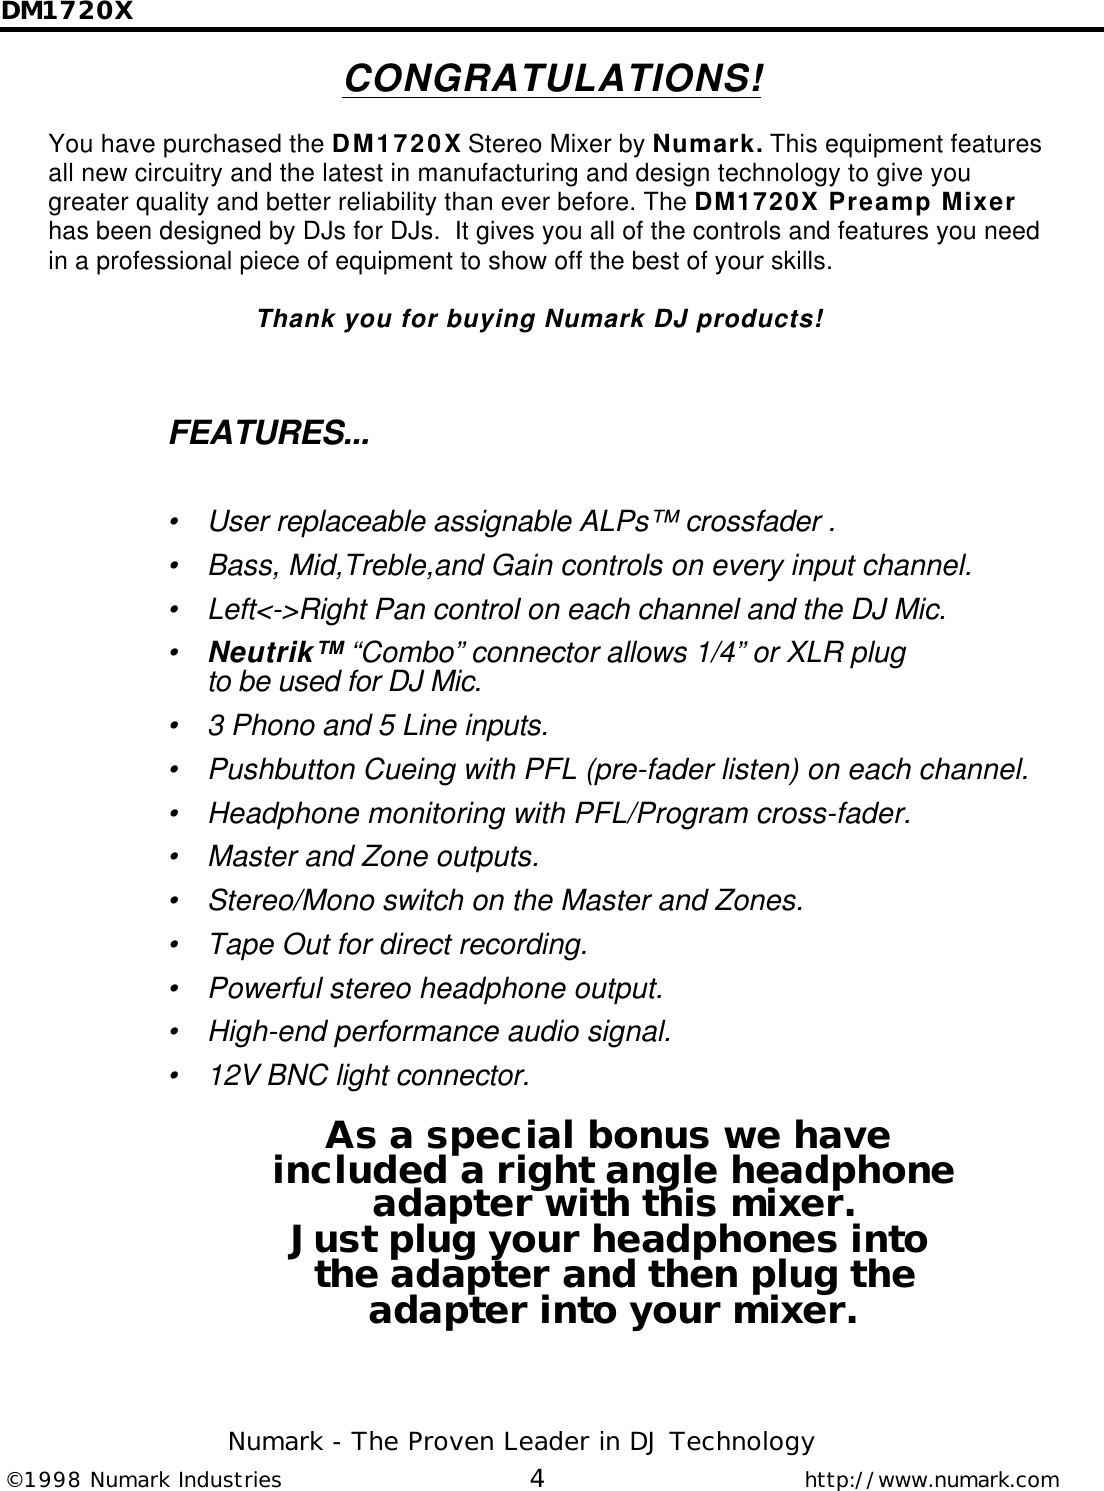 Numark Industries Dm1720X Users Manual